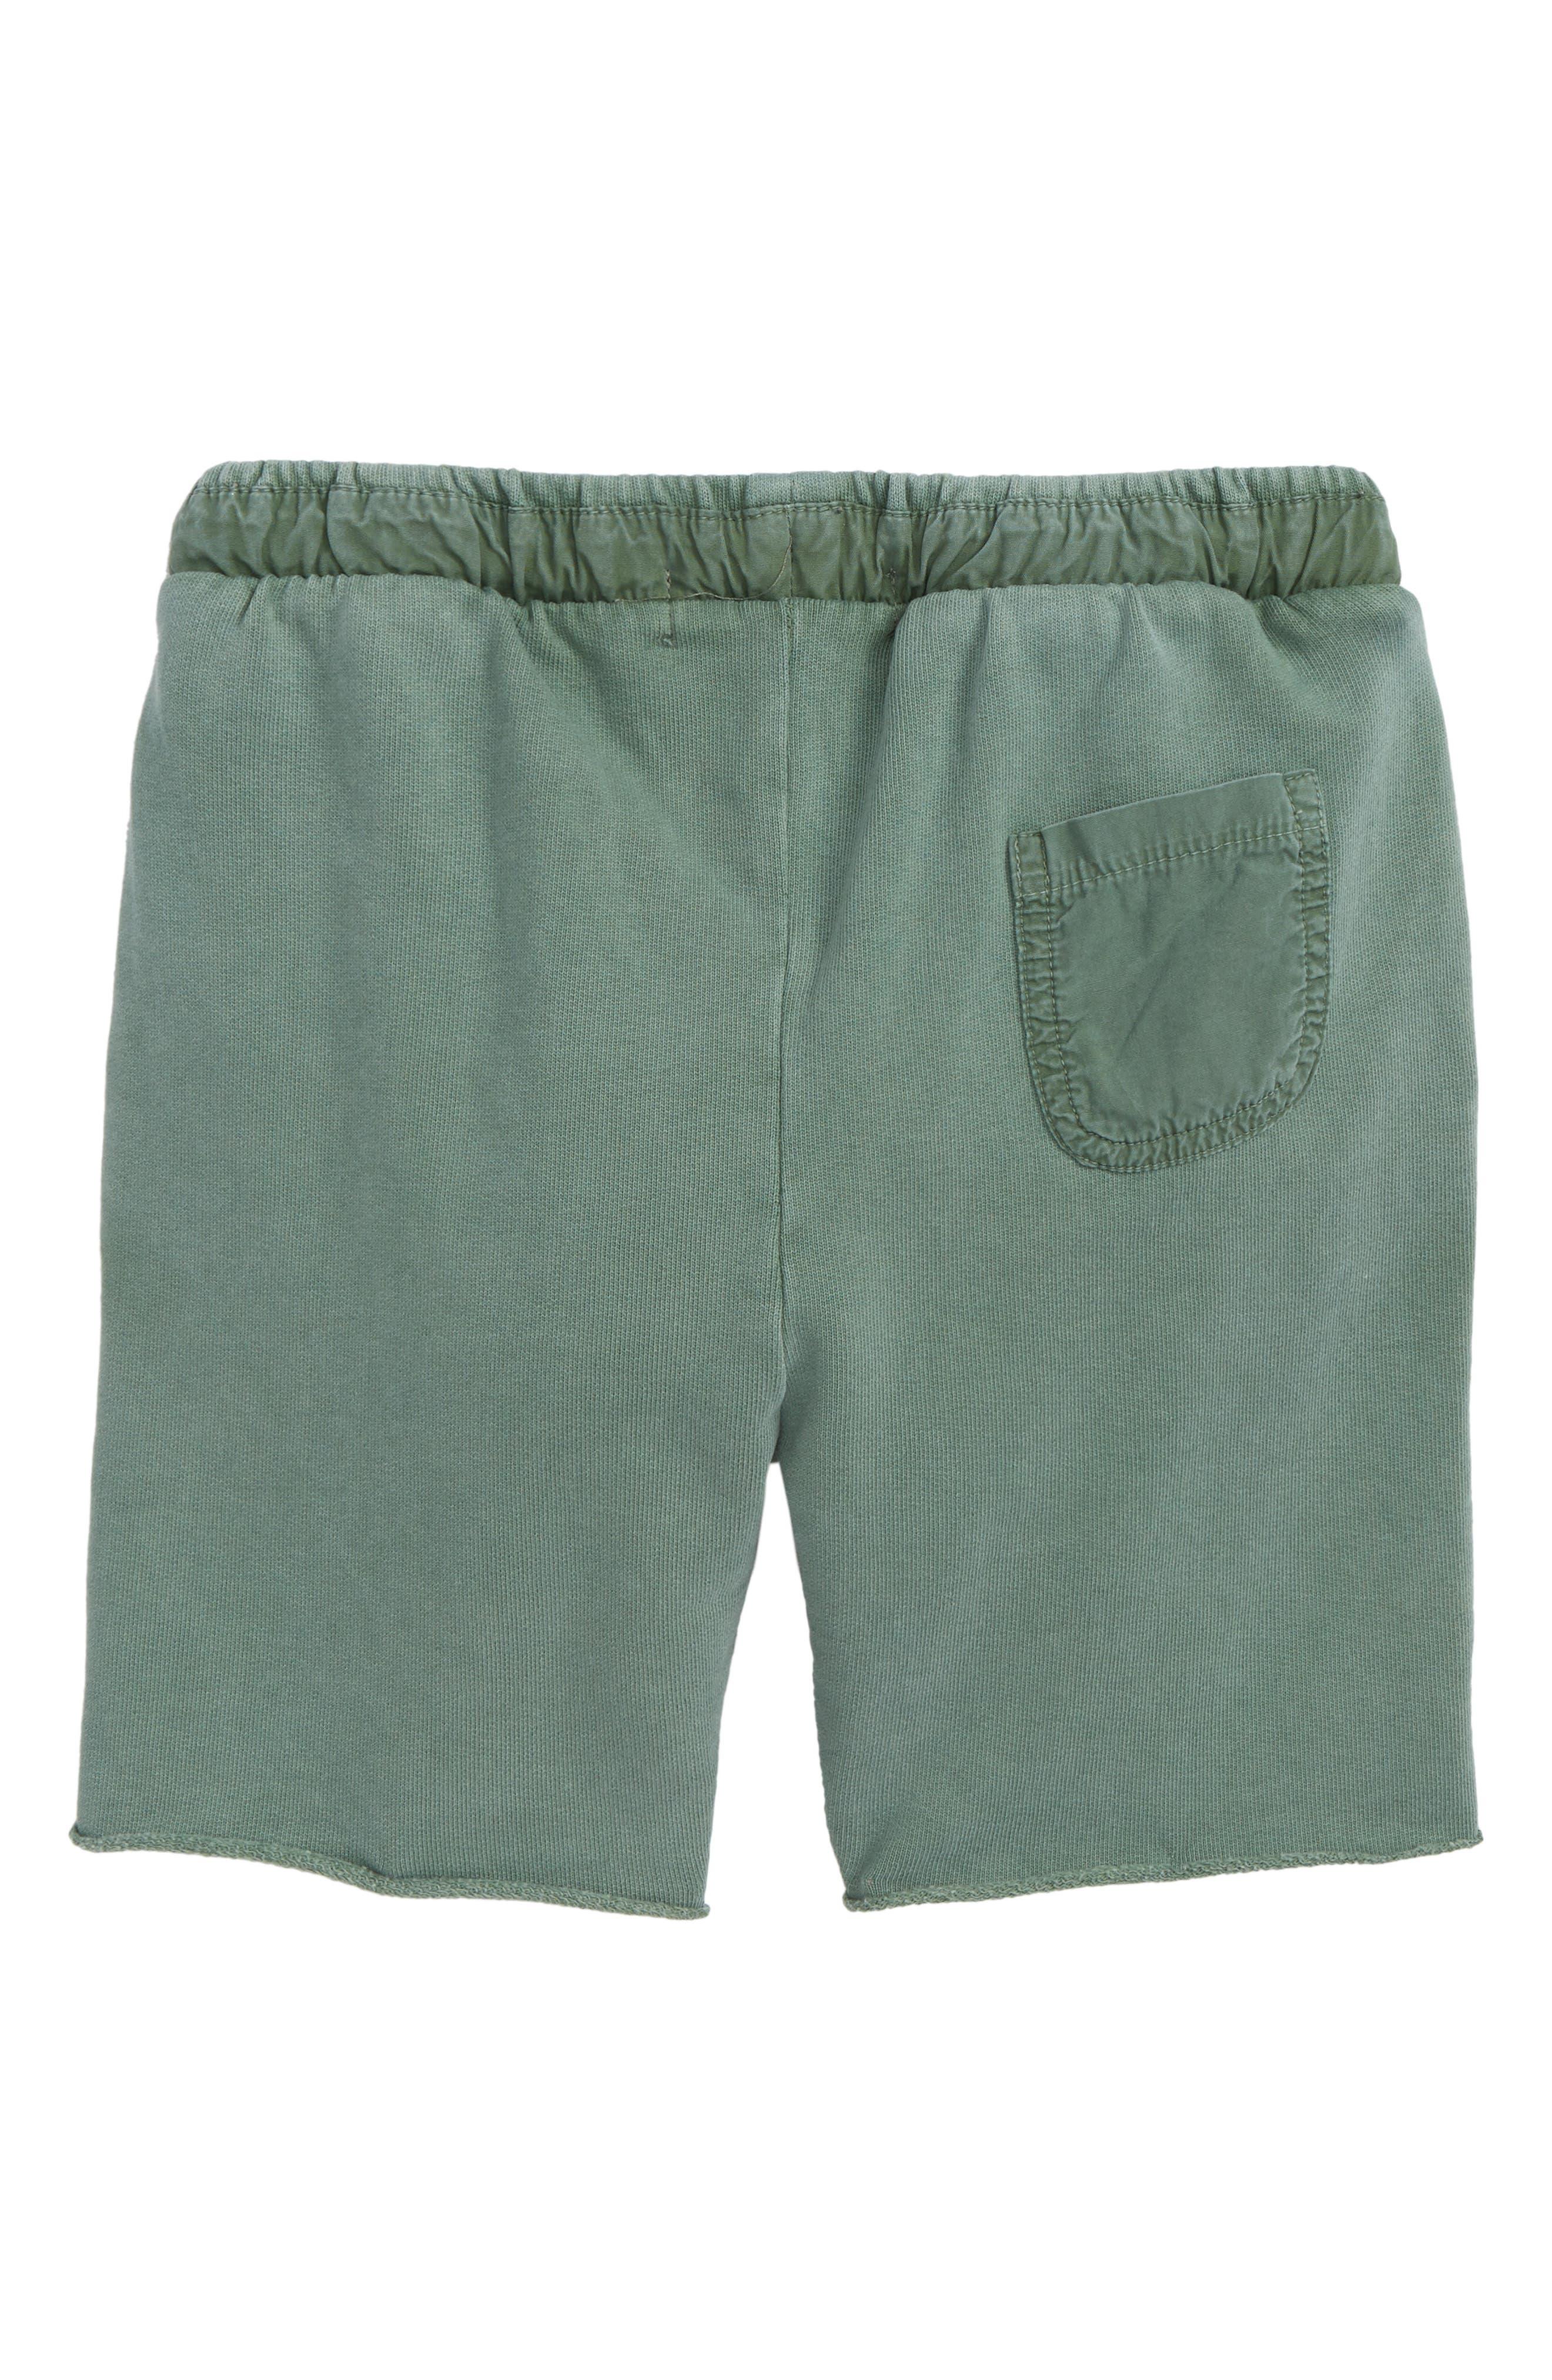 Kids Cullen Organic Cotton Shorts,                             Alternate thumbnail 2, color,                             370